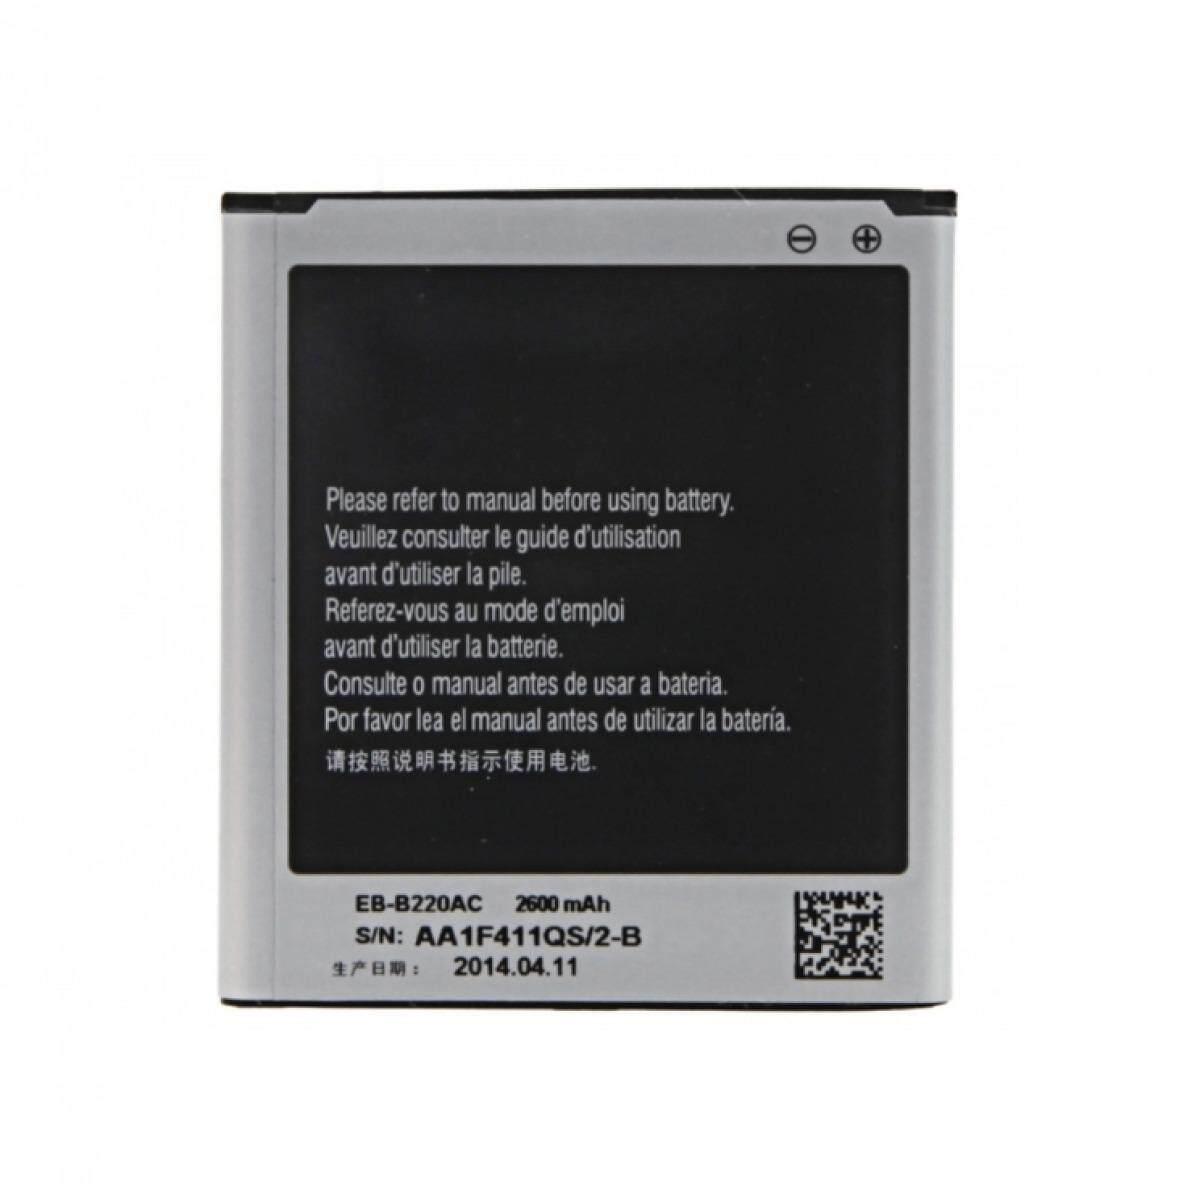 Kios Samsung Galaxy J2 Prime G530 Eb Bg530cbe 2600mah Battery Dan Baterai Grand Original 2 B220ac Standard